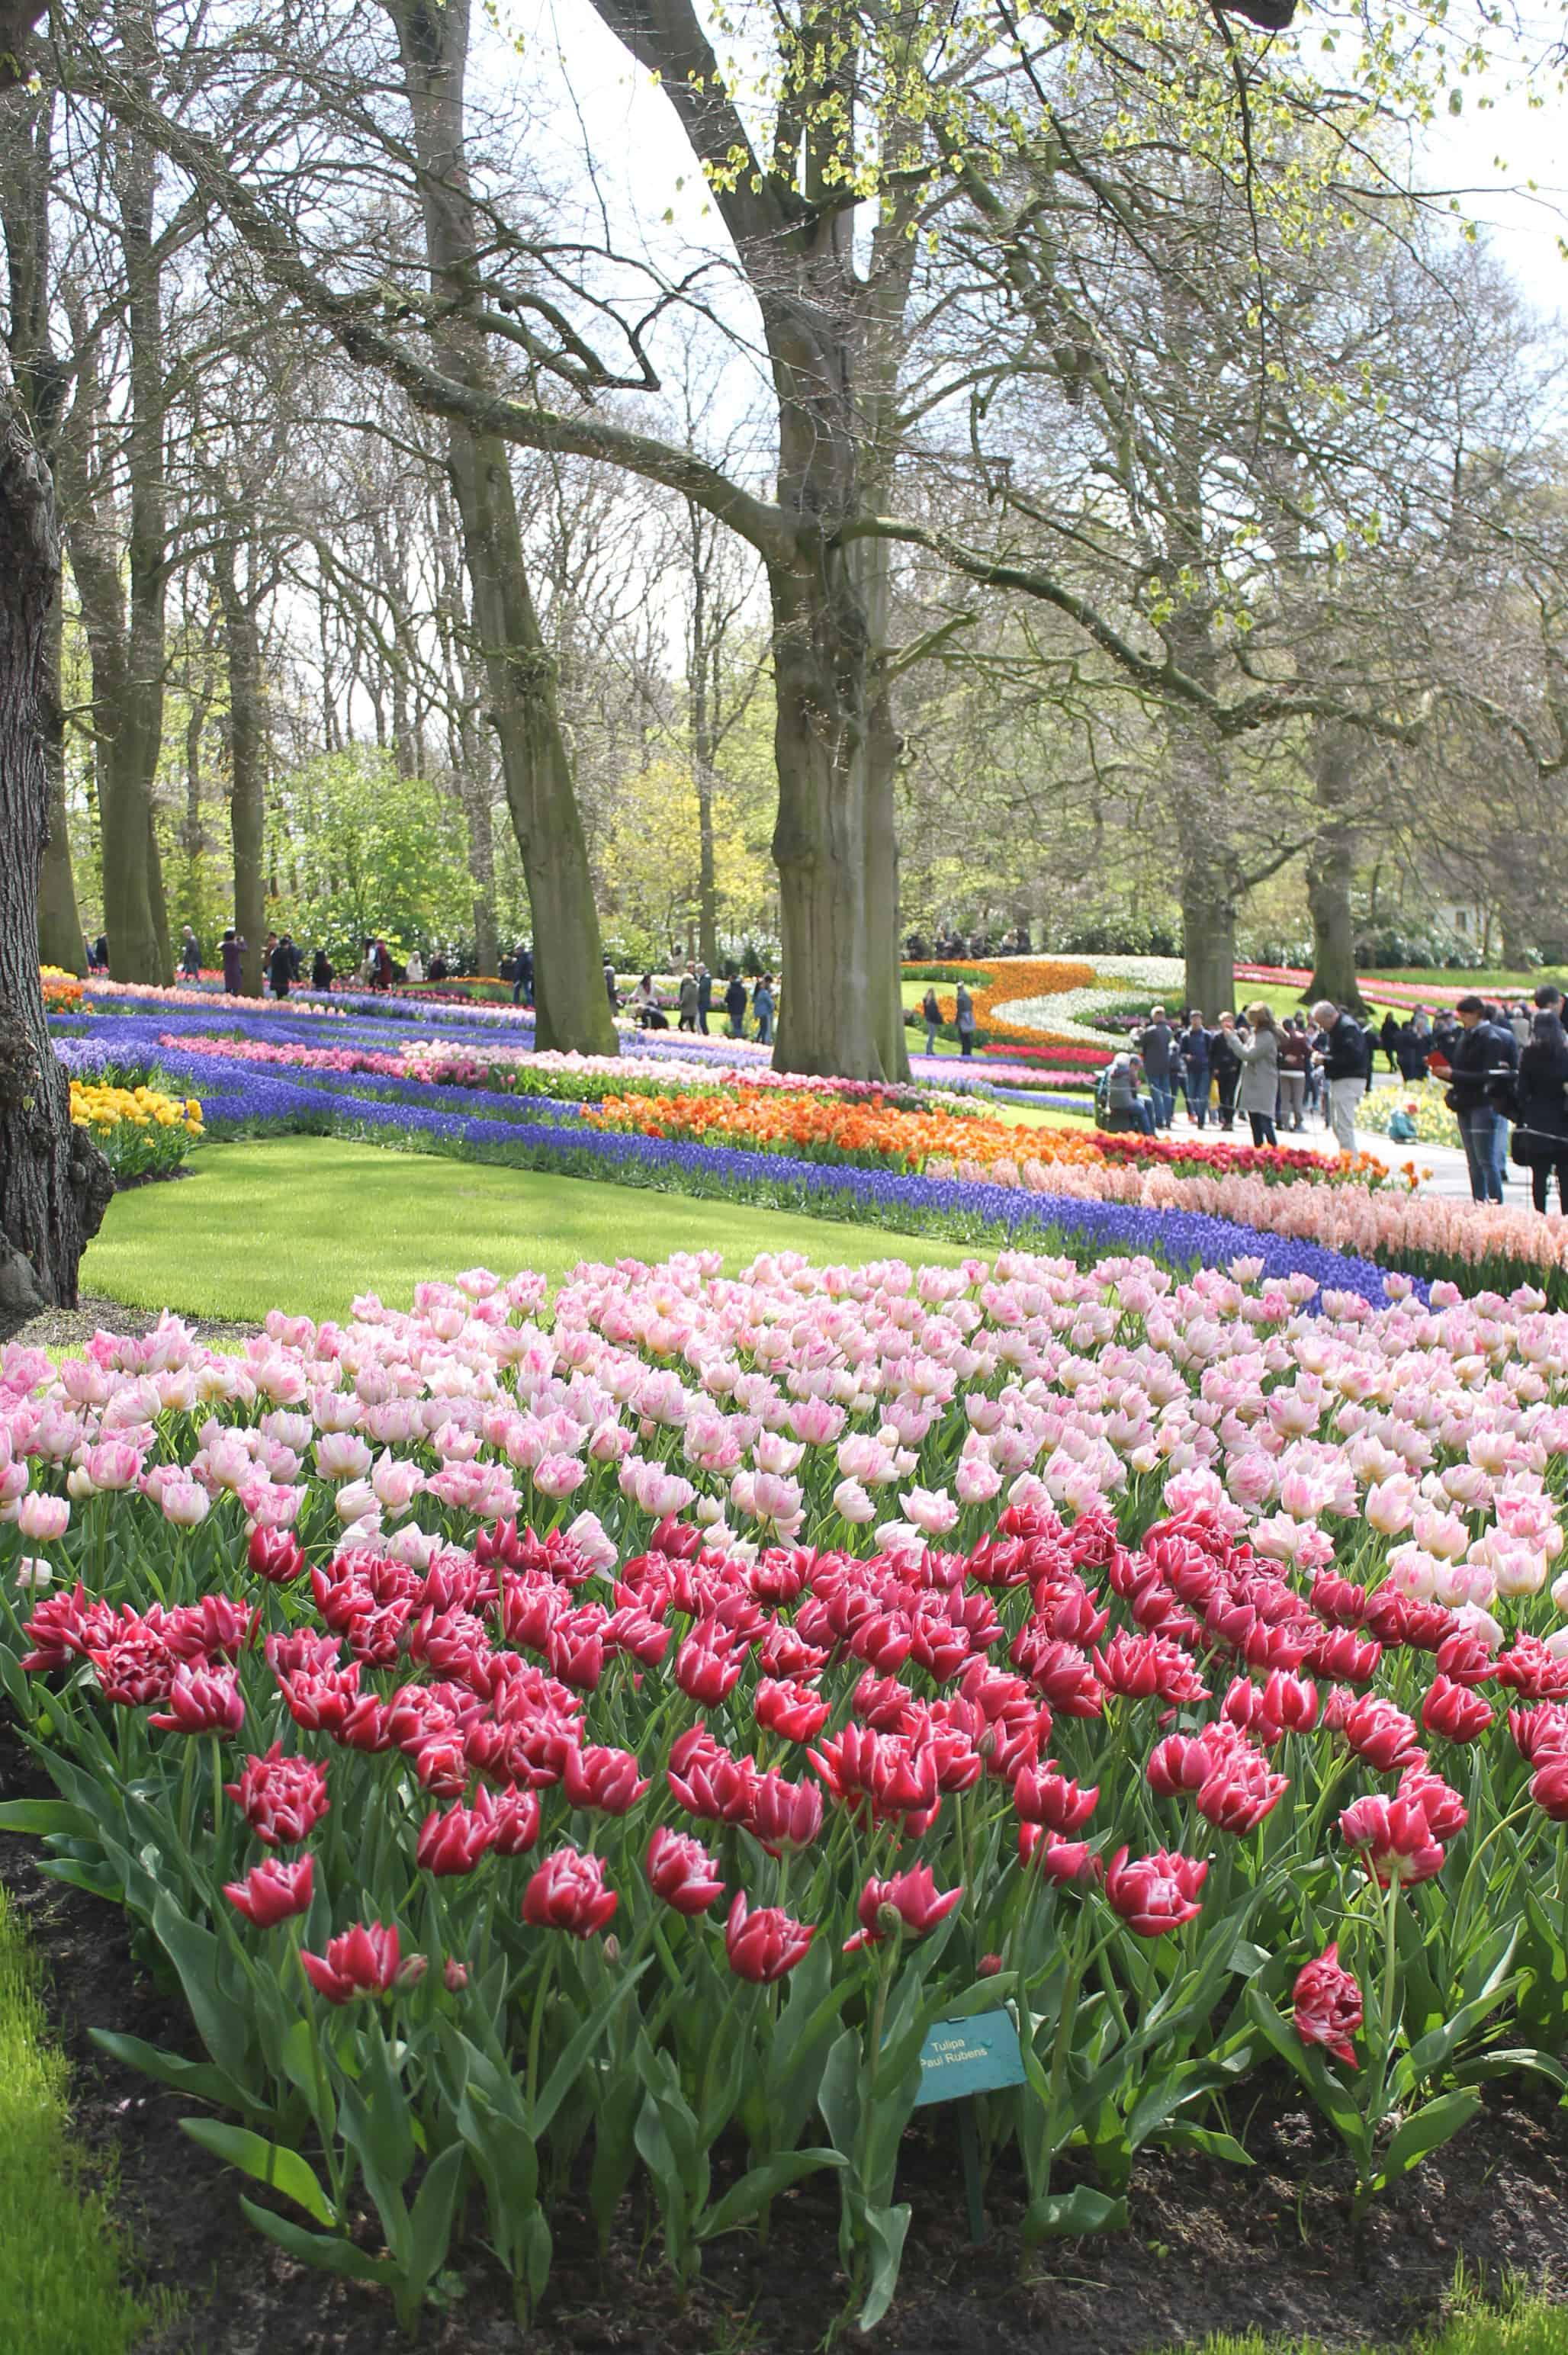 Tulips at Keukenhof garden, Netherlands